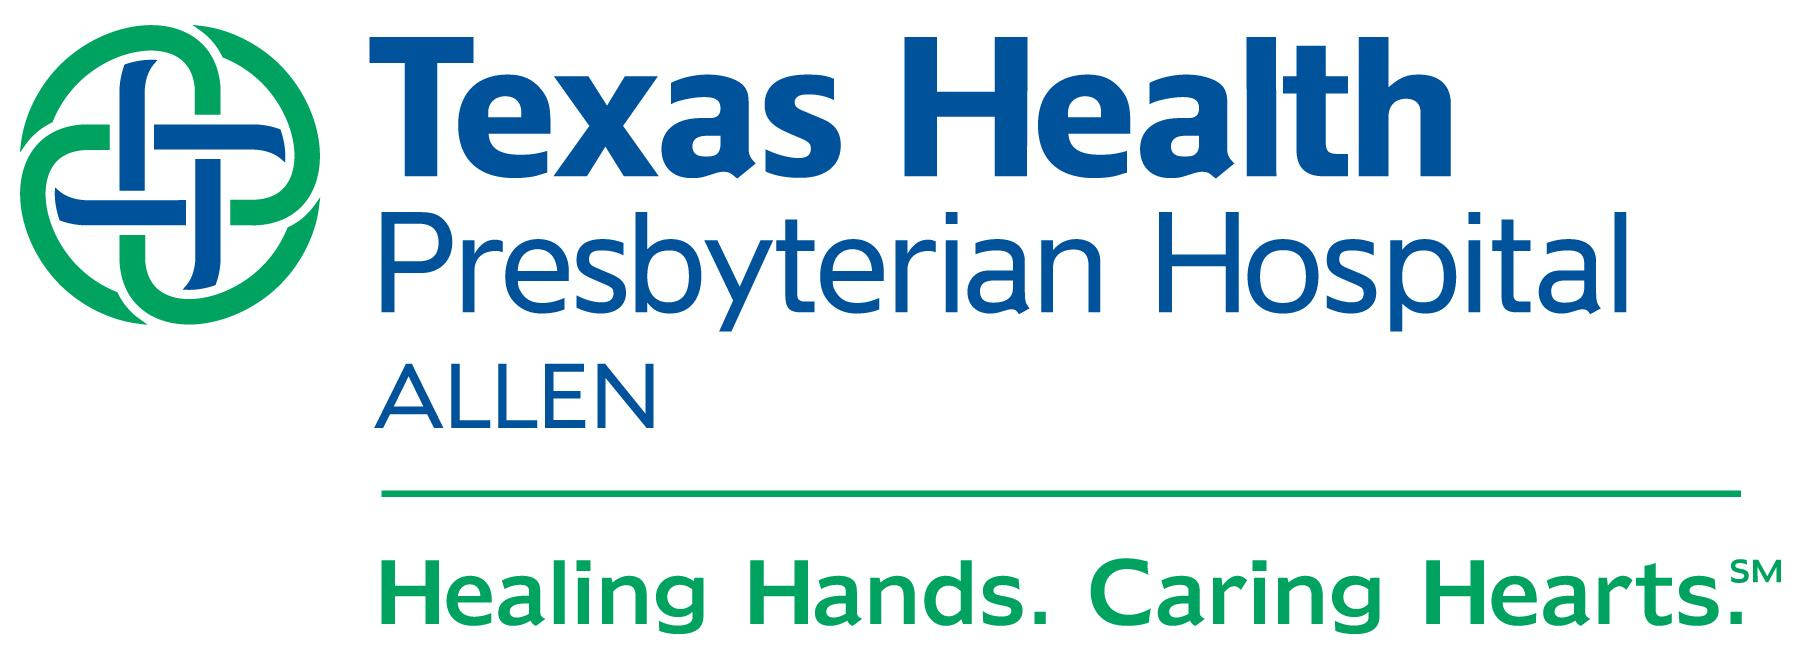 Immediate need for a Neurologist in Allen, Texas - Texas Health Presbyterian Hospital Allen